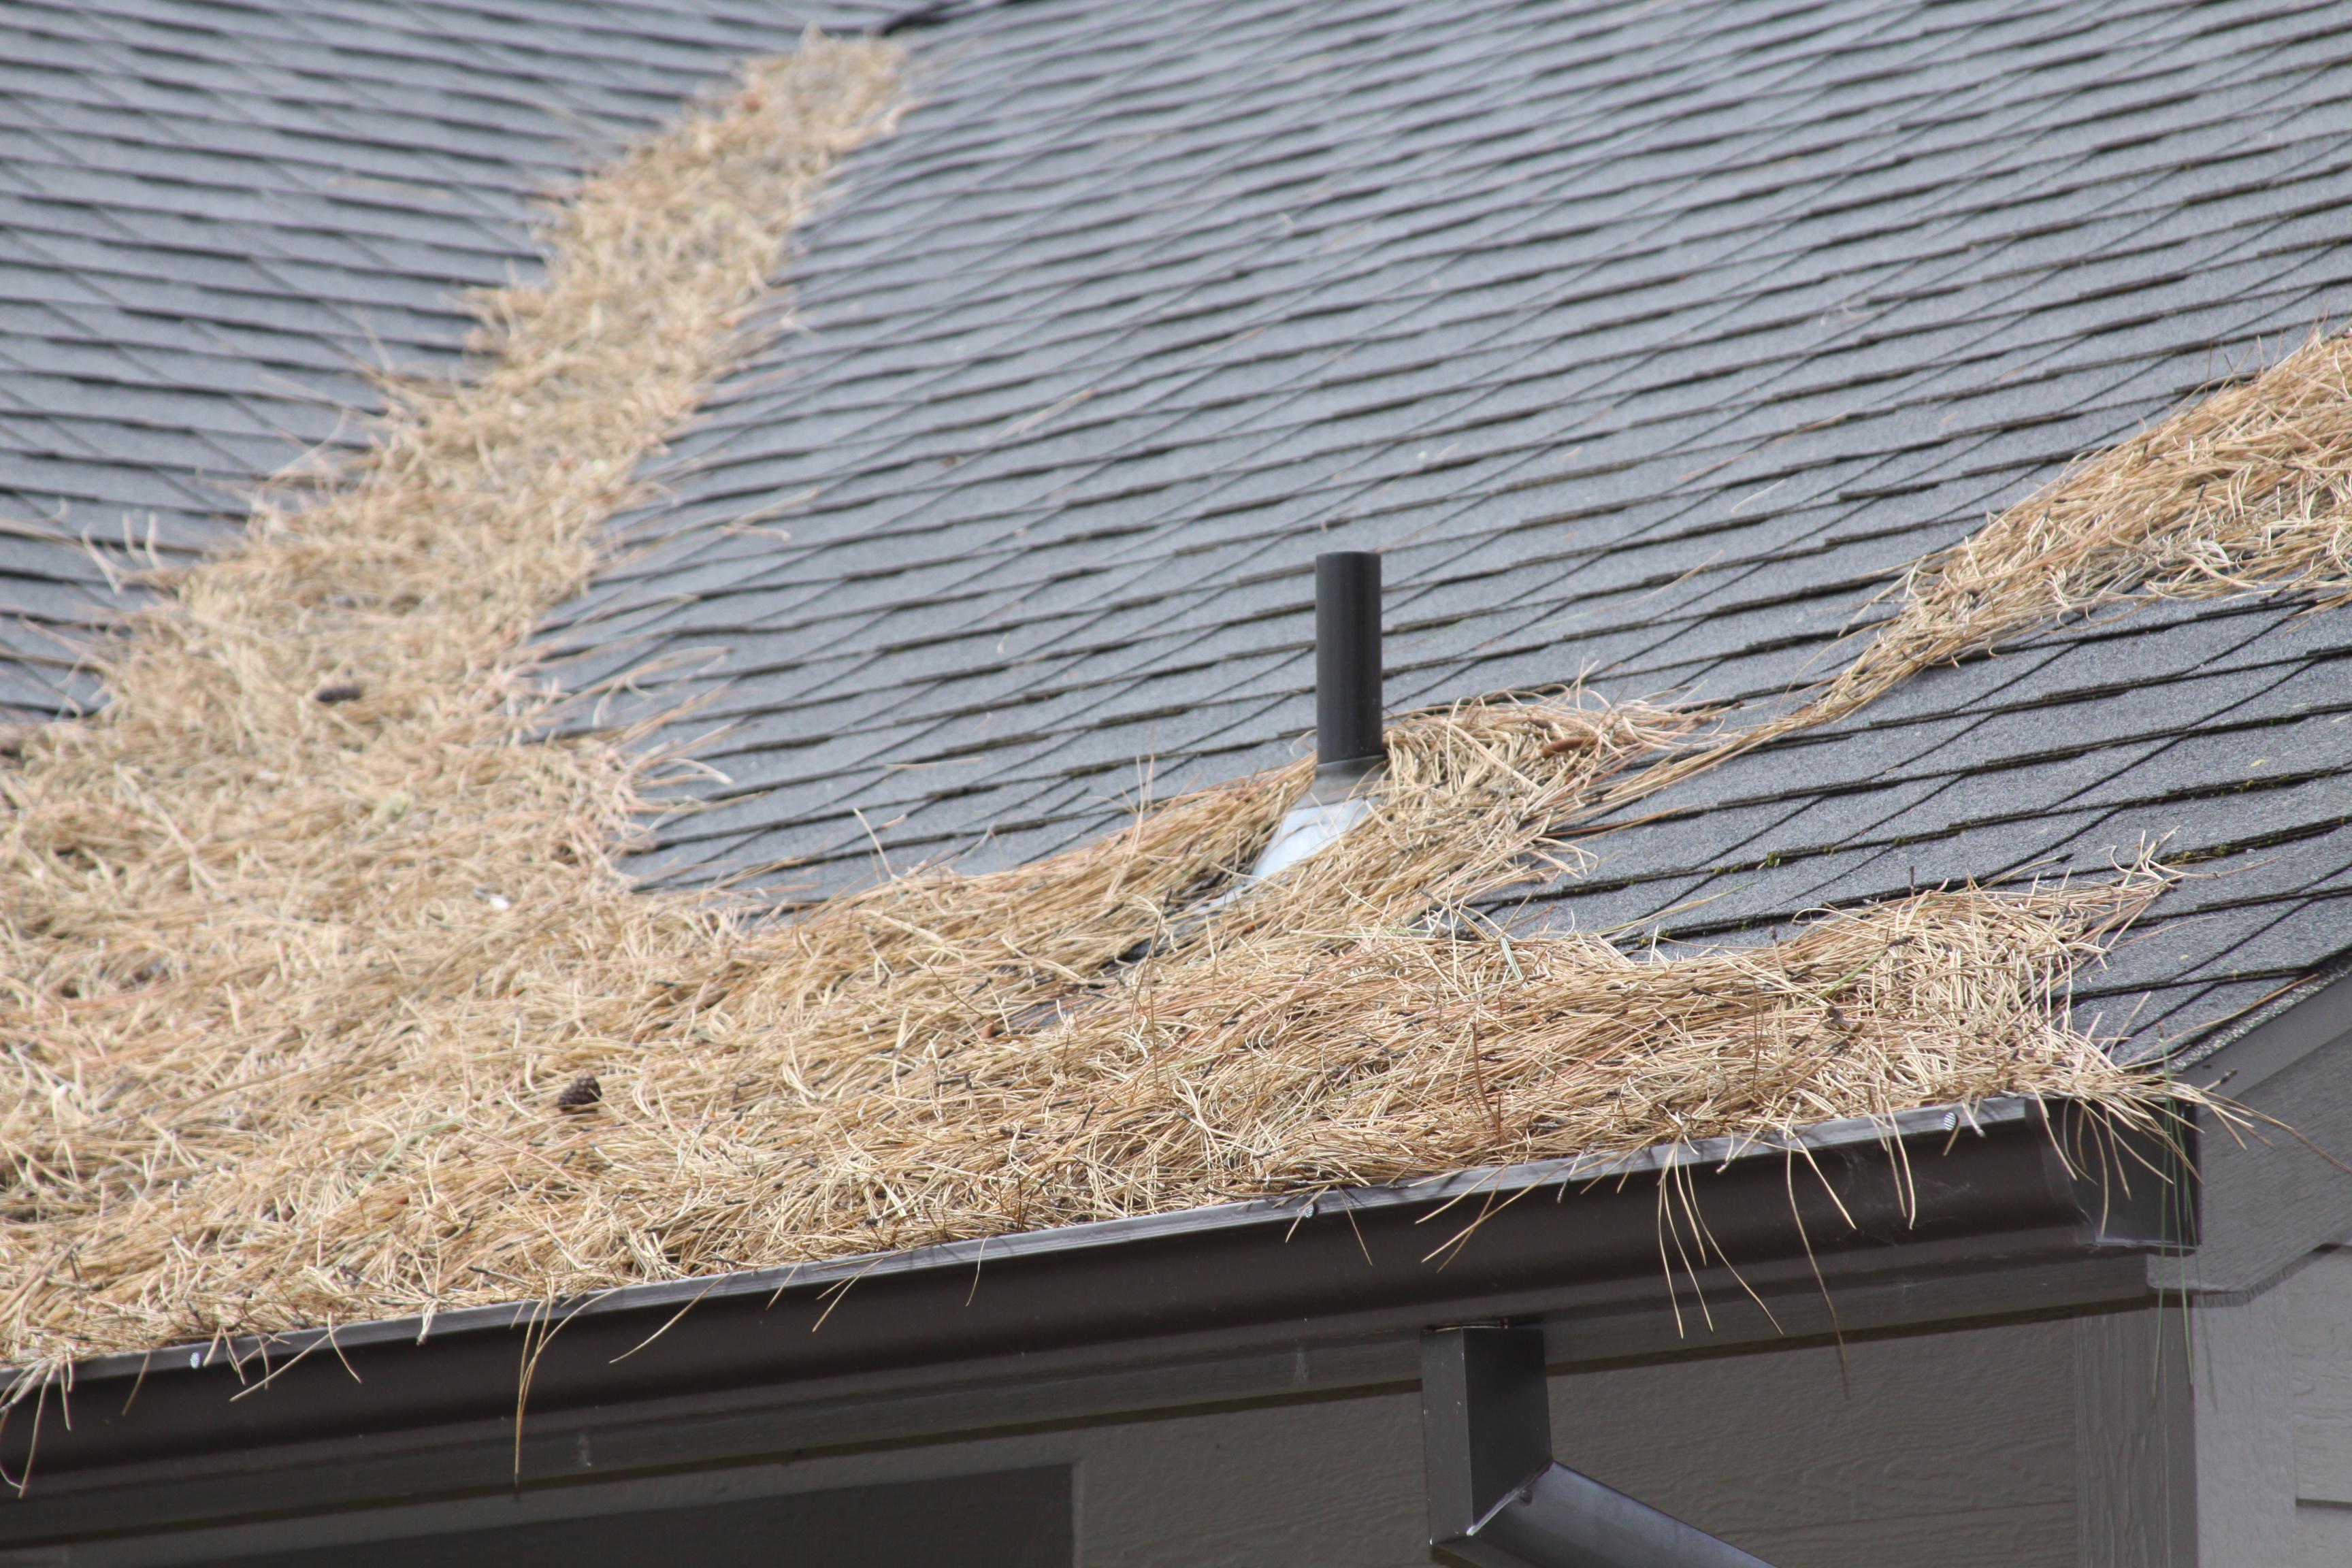 tree litter on roof